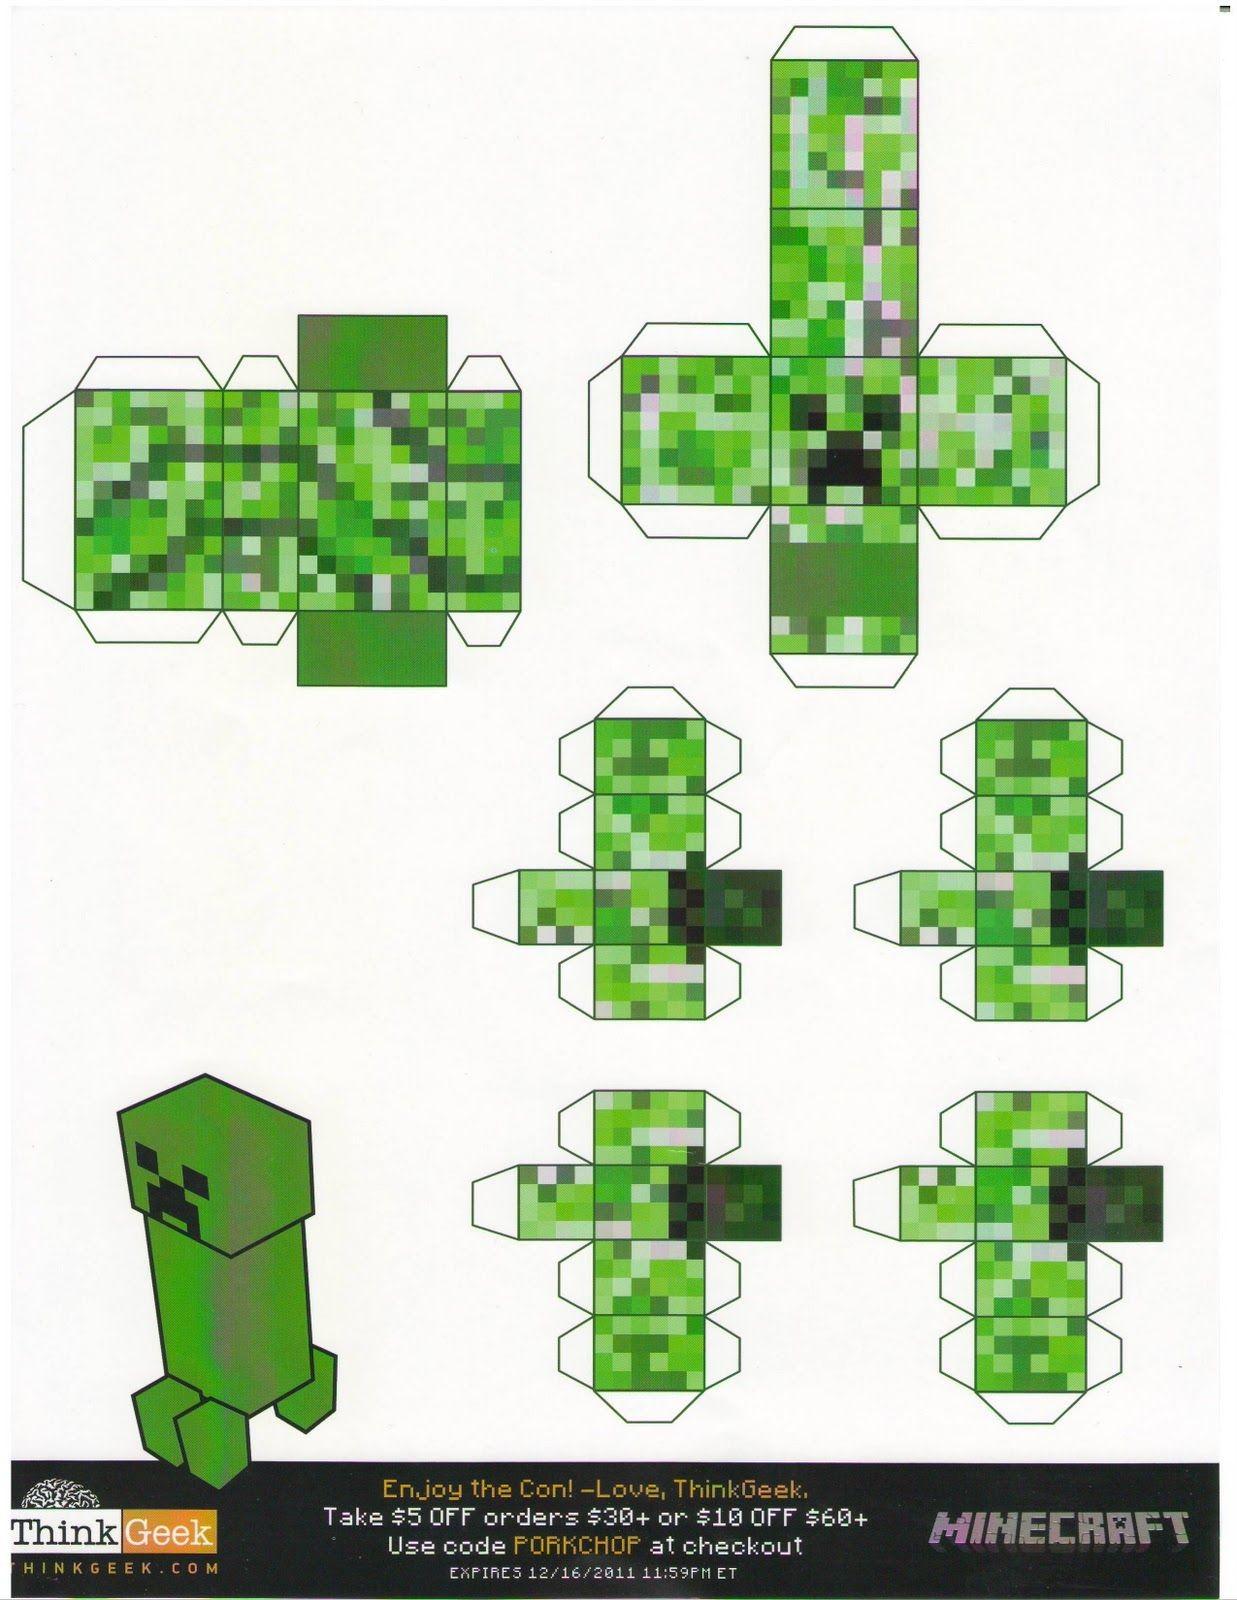 Minecraft Papercraft Figures Minecraft Papercraft Creepers Tiny Papercraft T